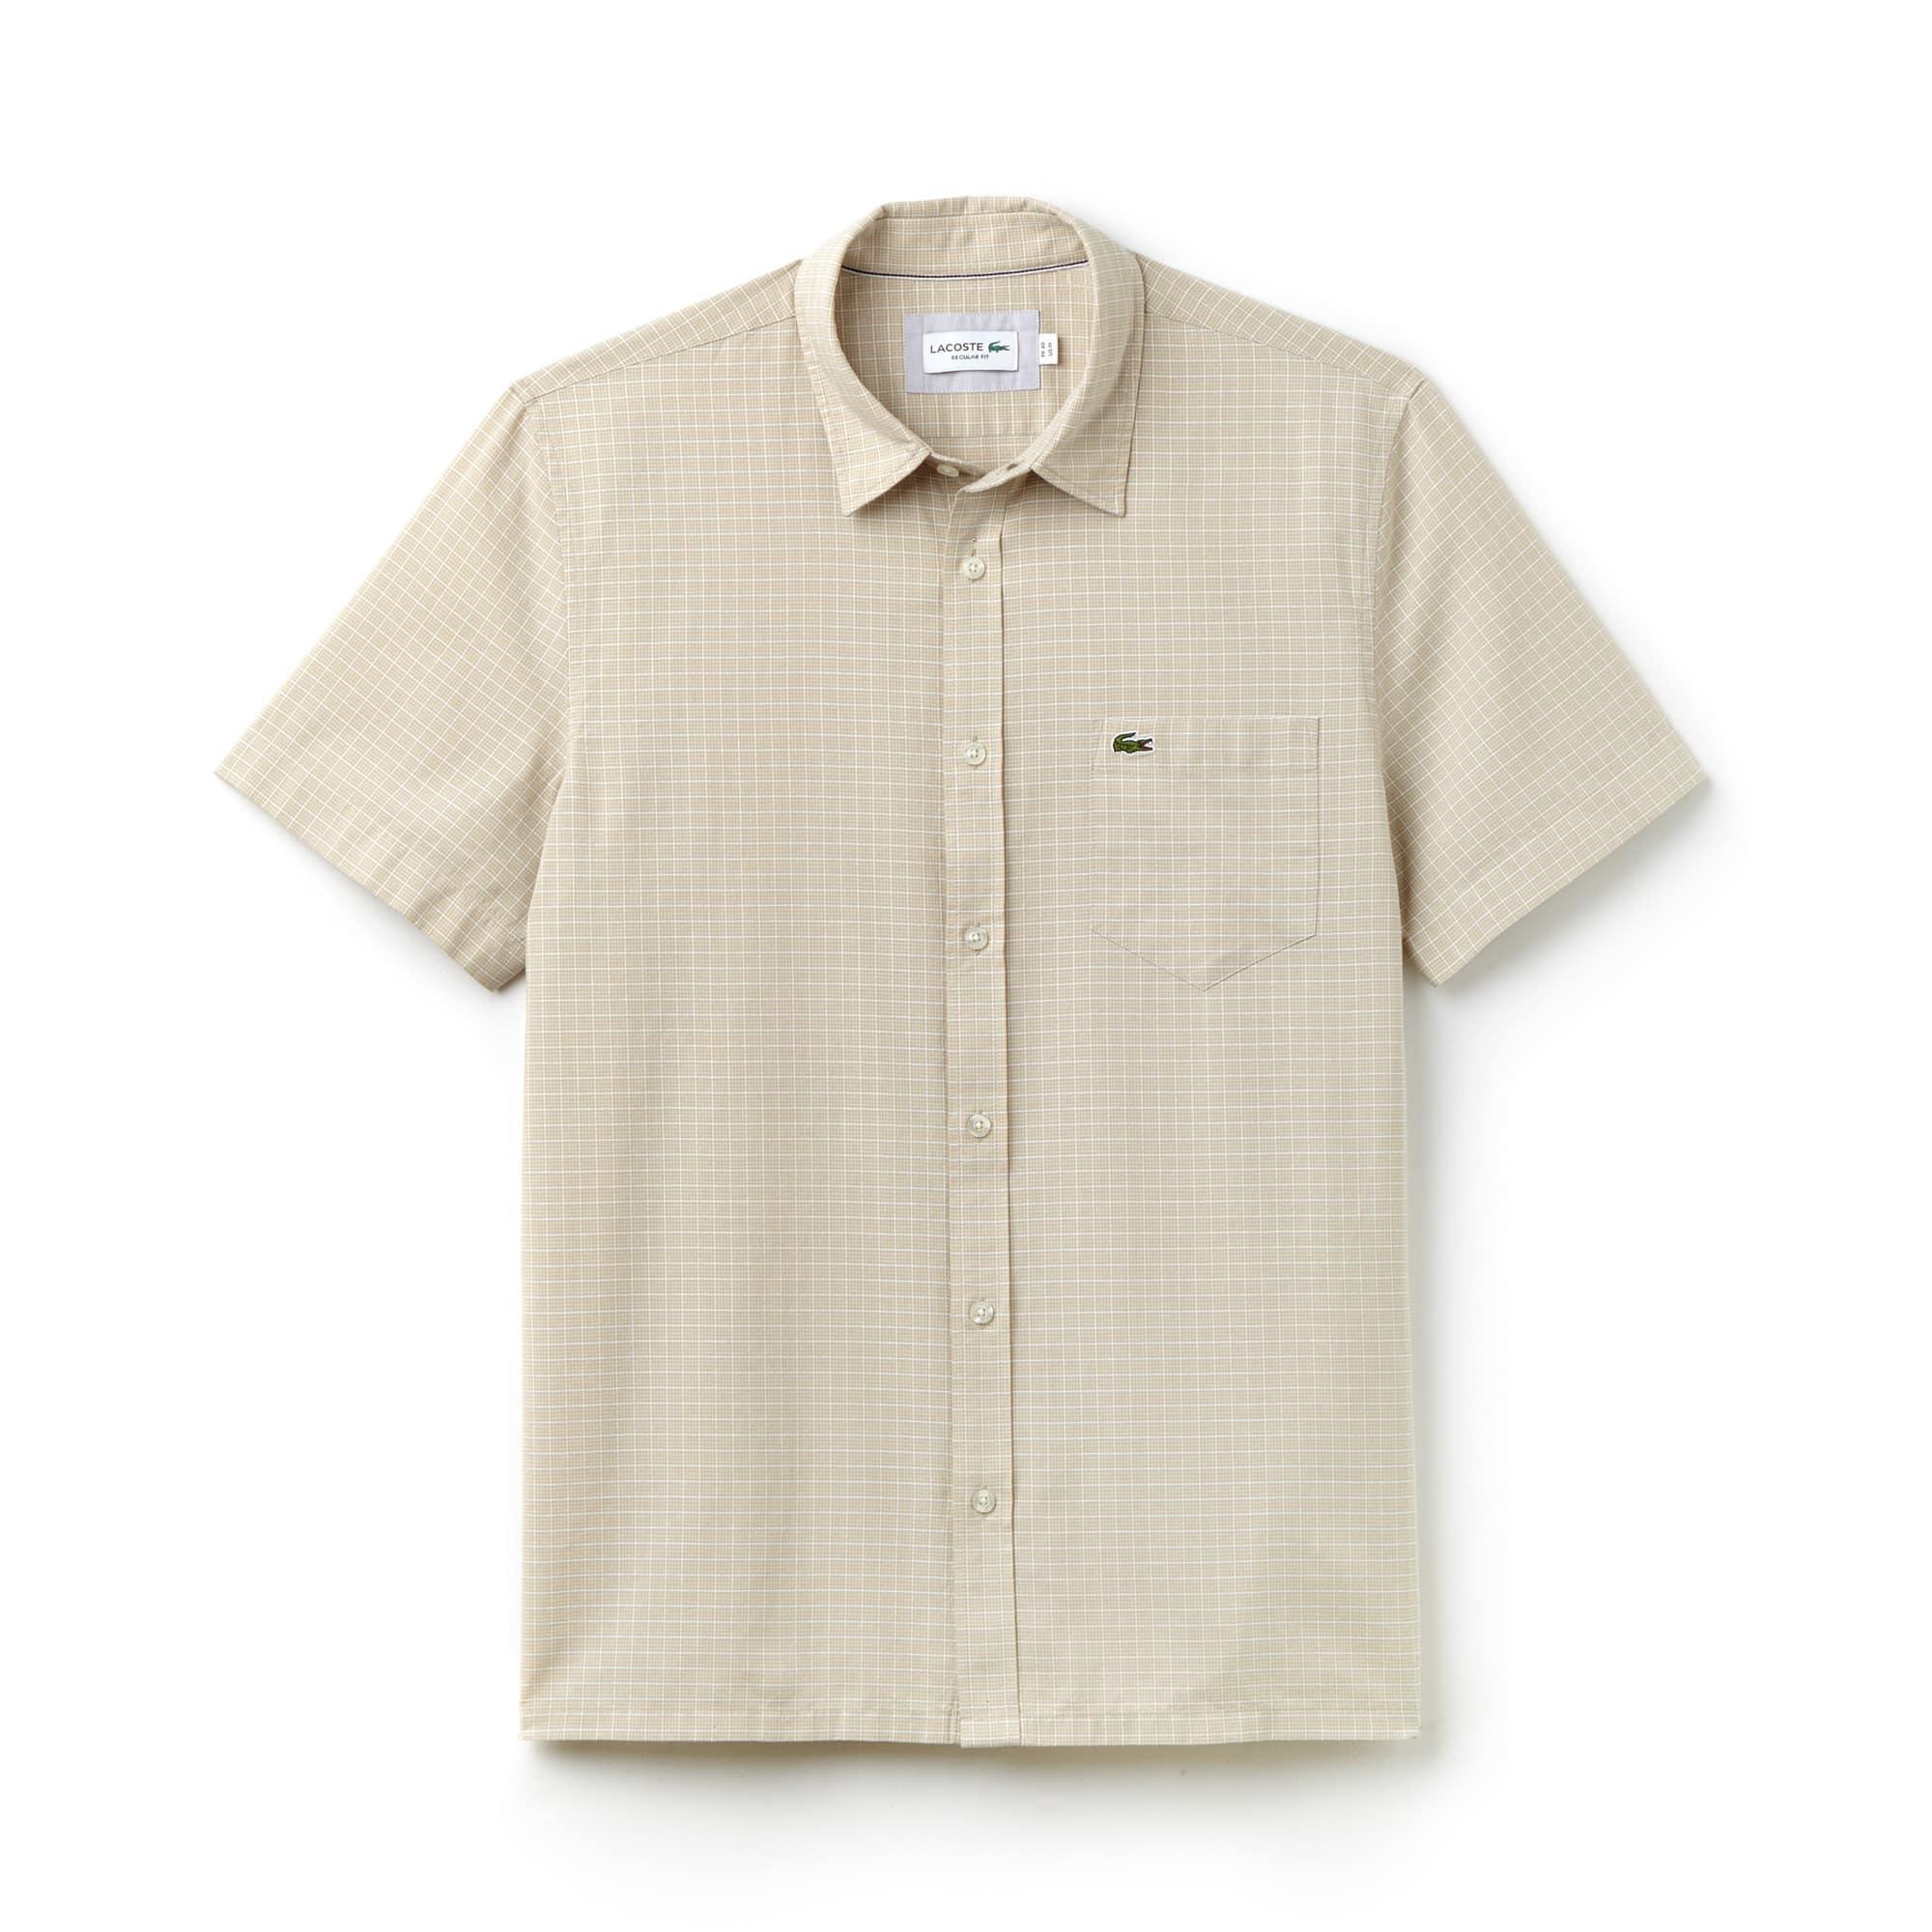 Camisa regular fit de popelín de cuadros con manga corta